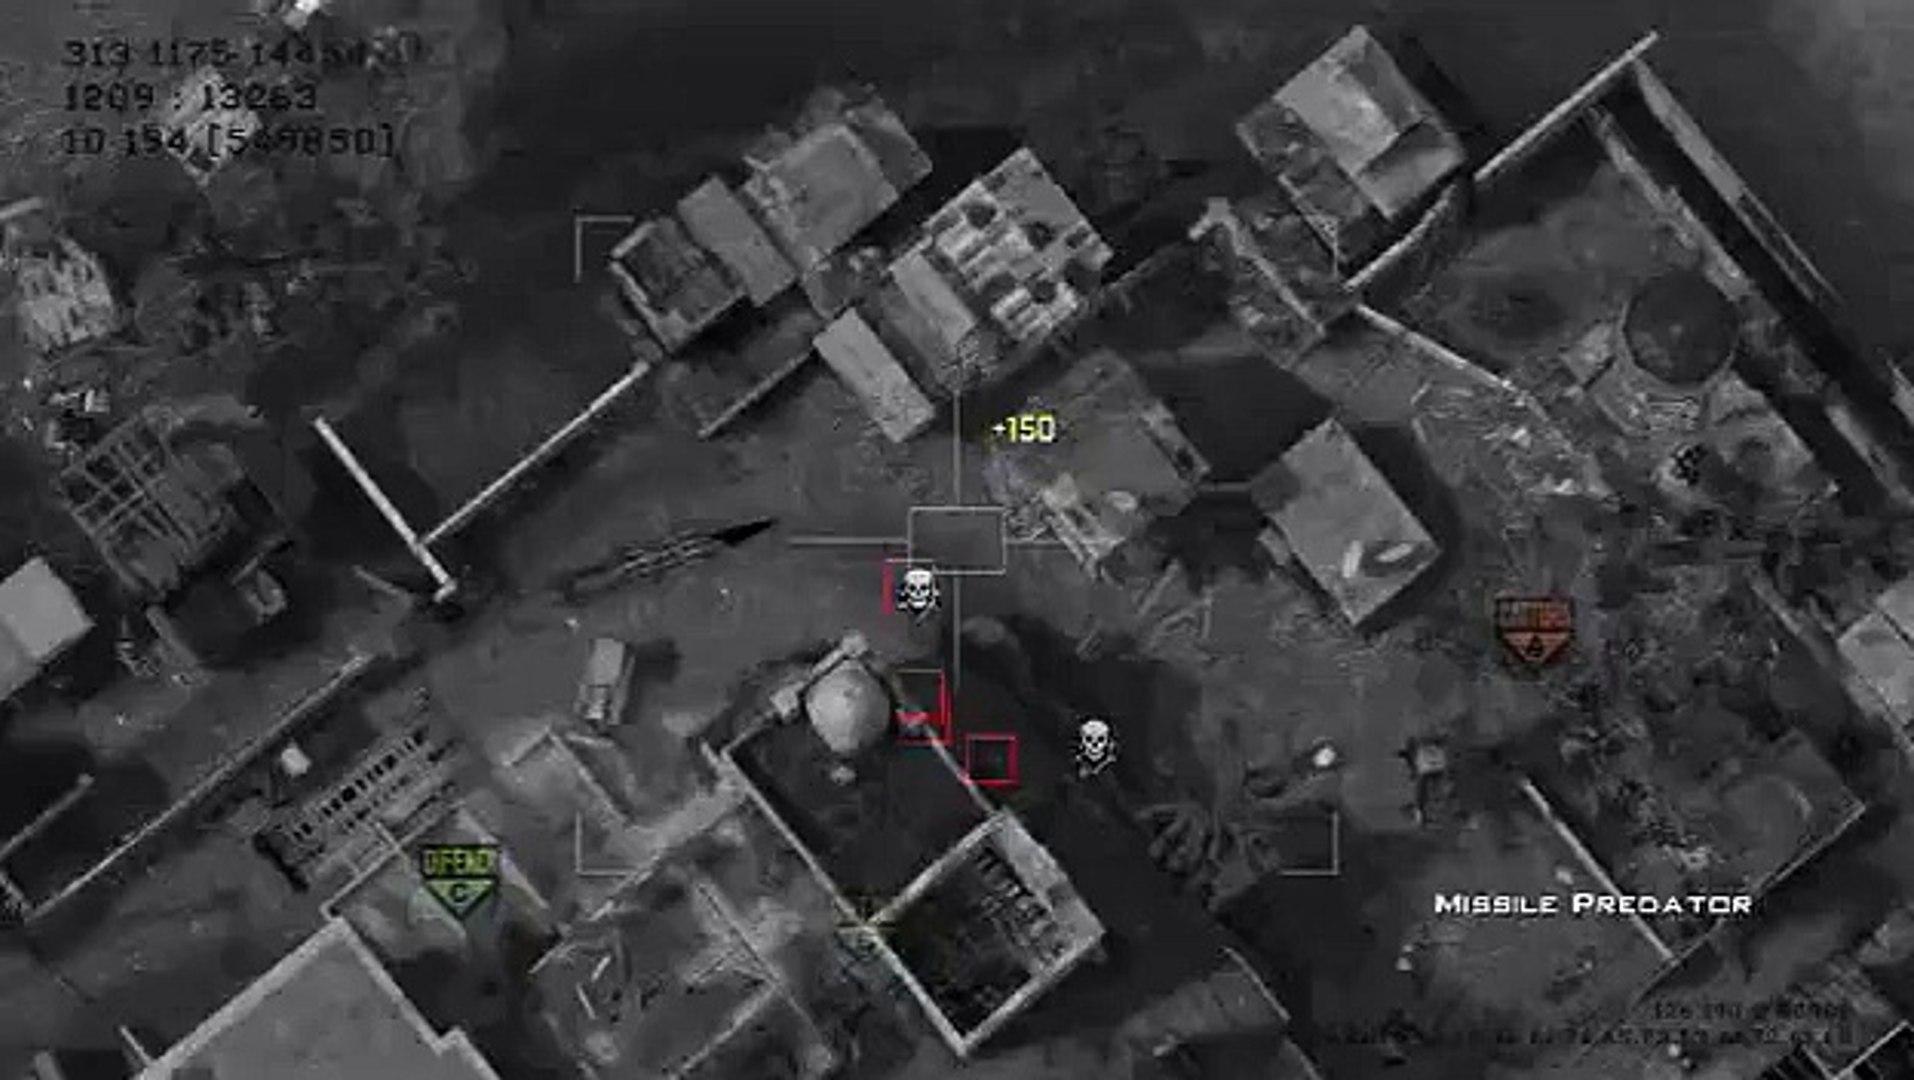 Predator Missile Mw2